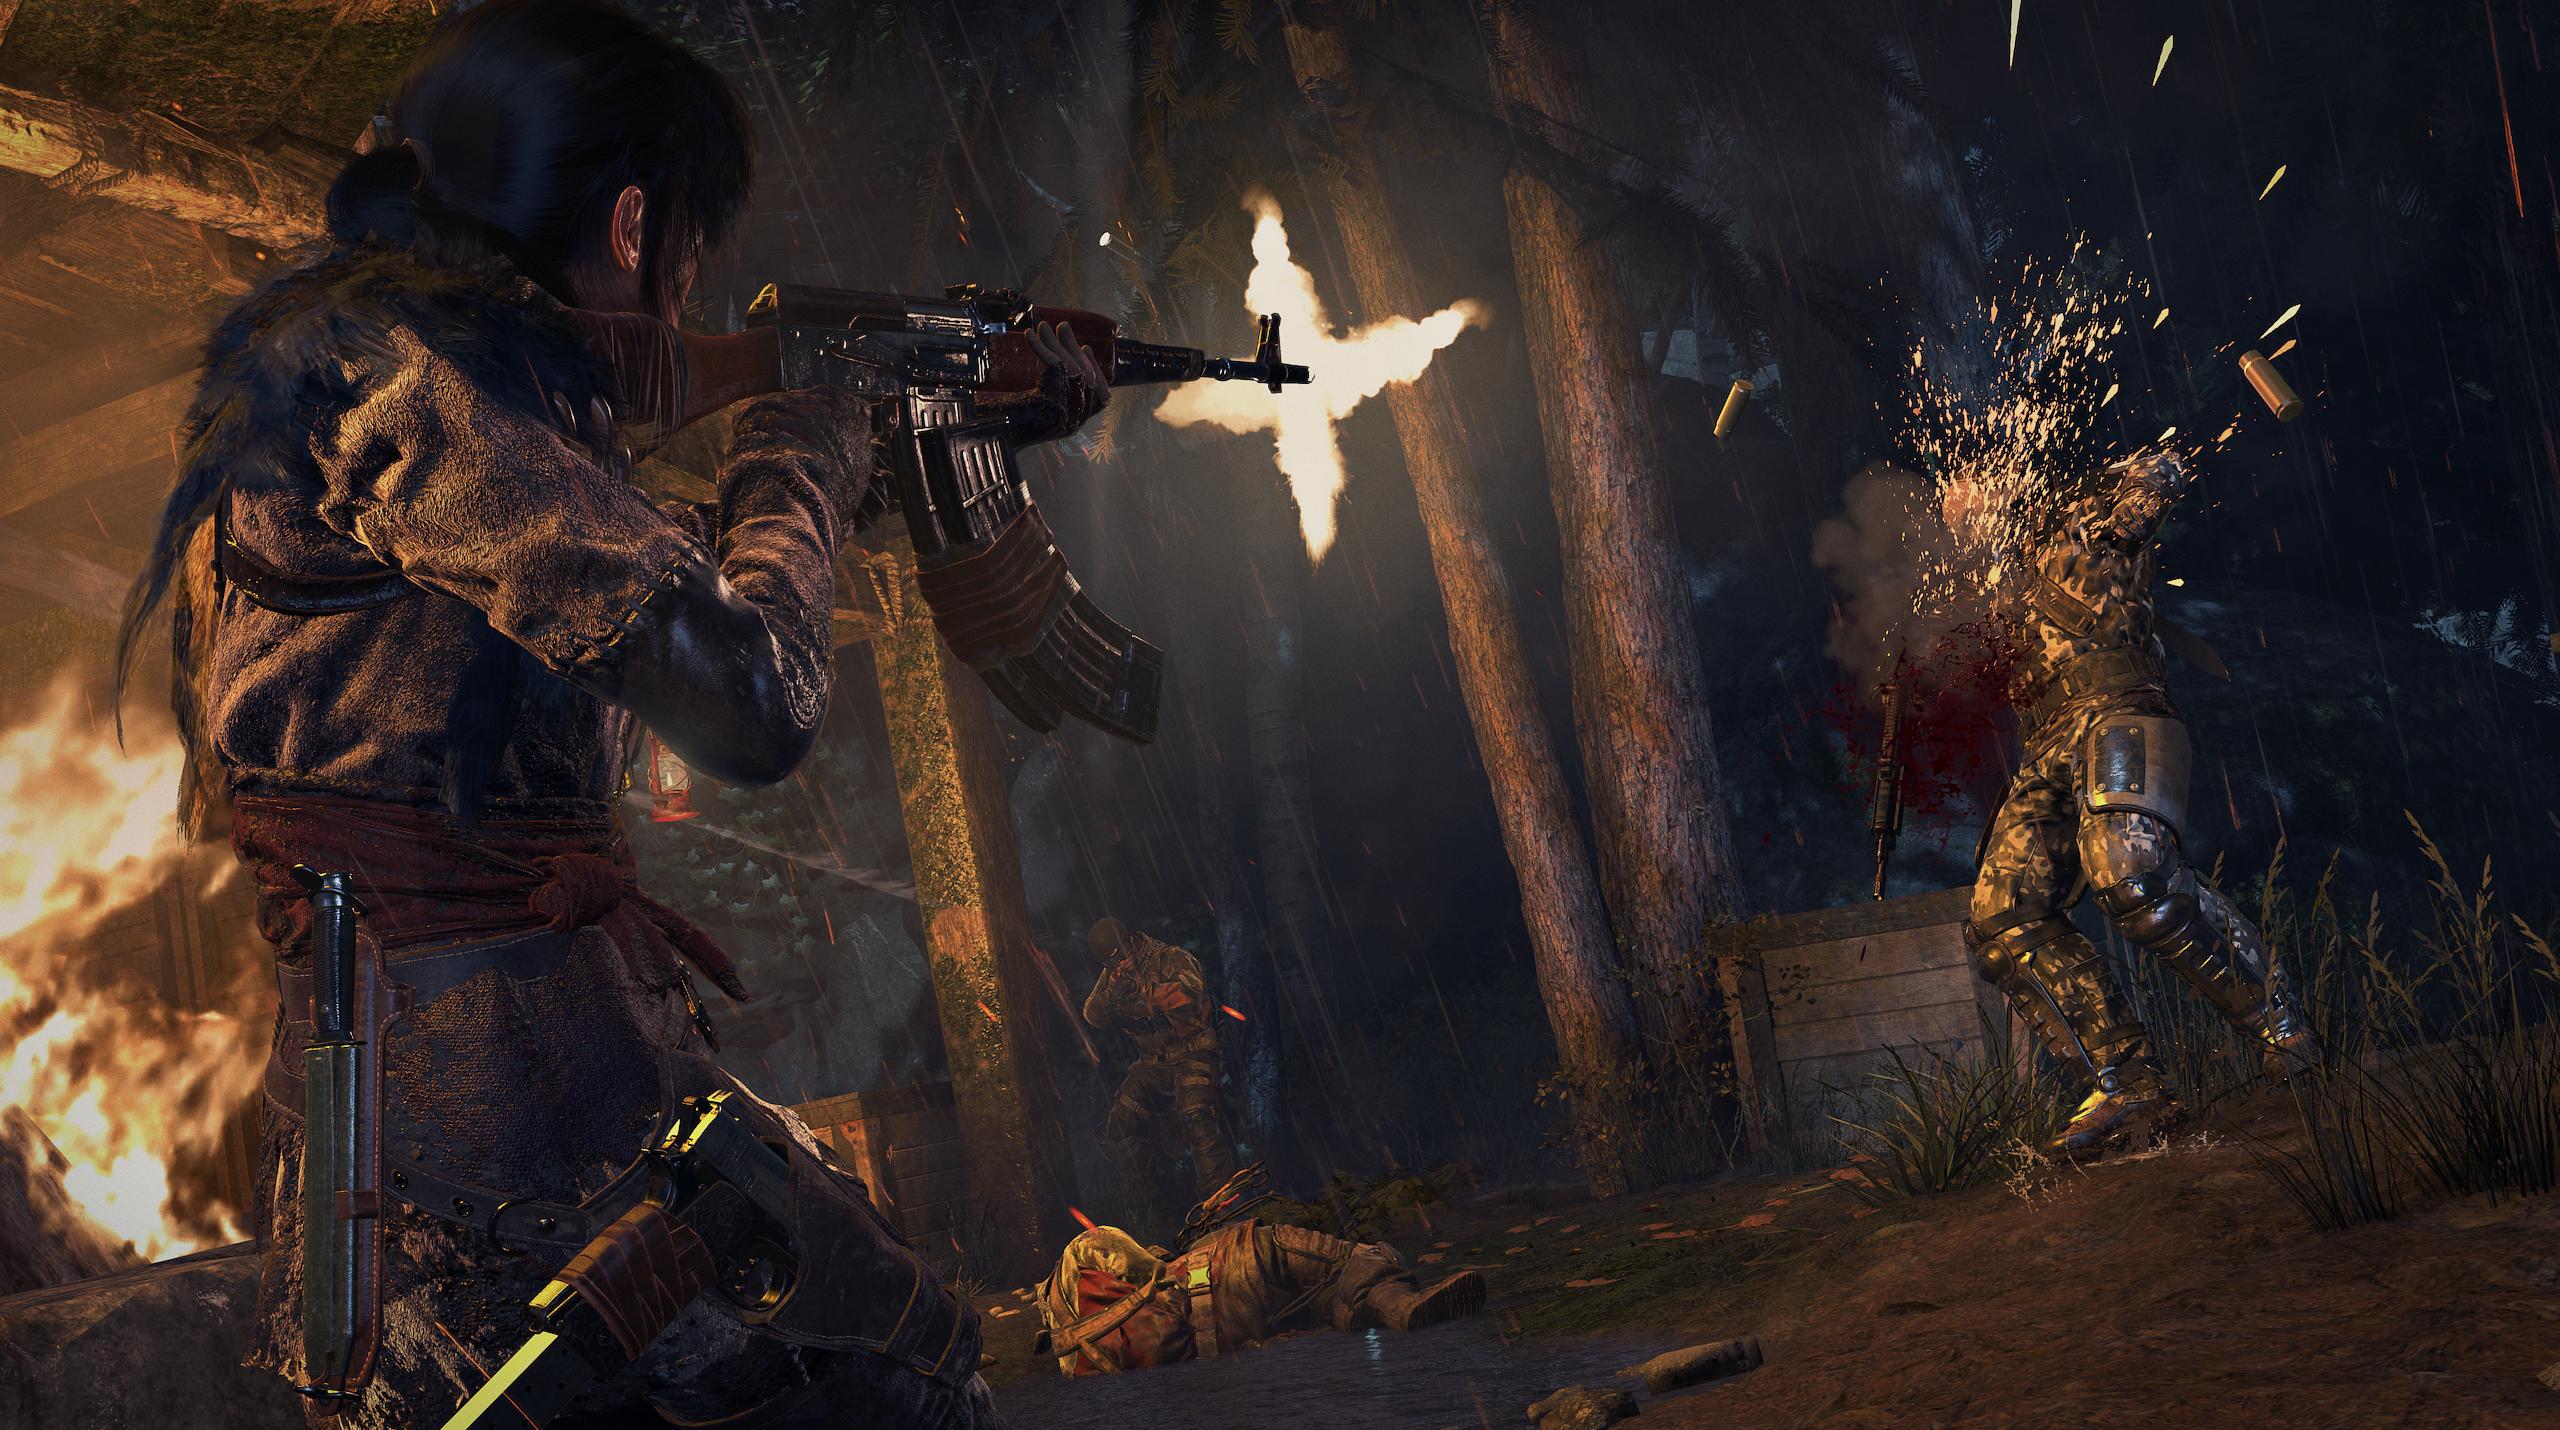 Rise Of The Tomb Raider überlebensverstecke